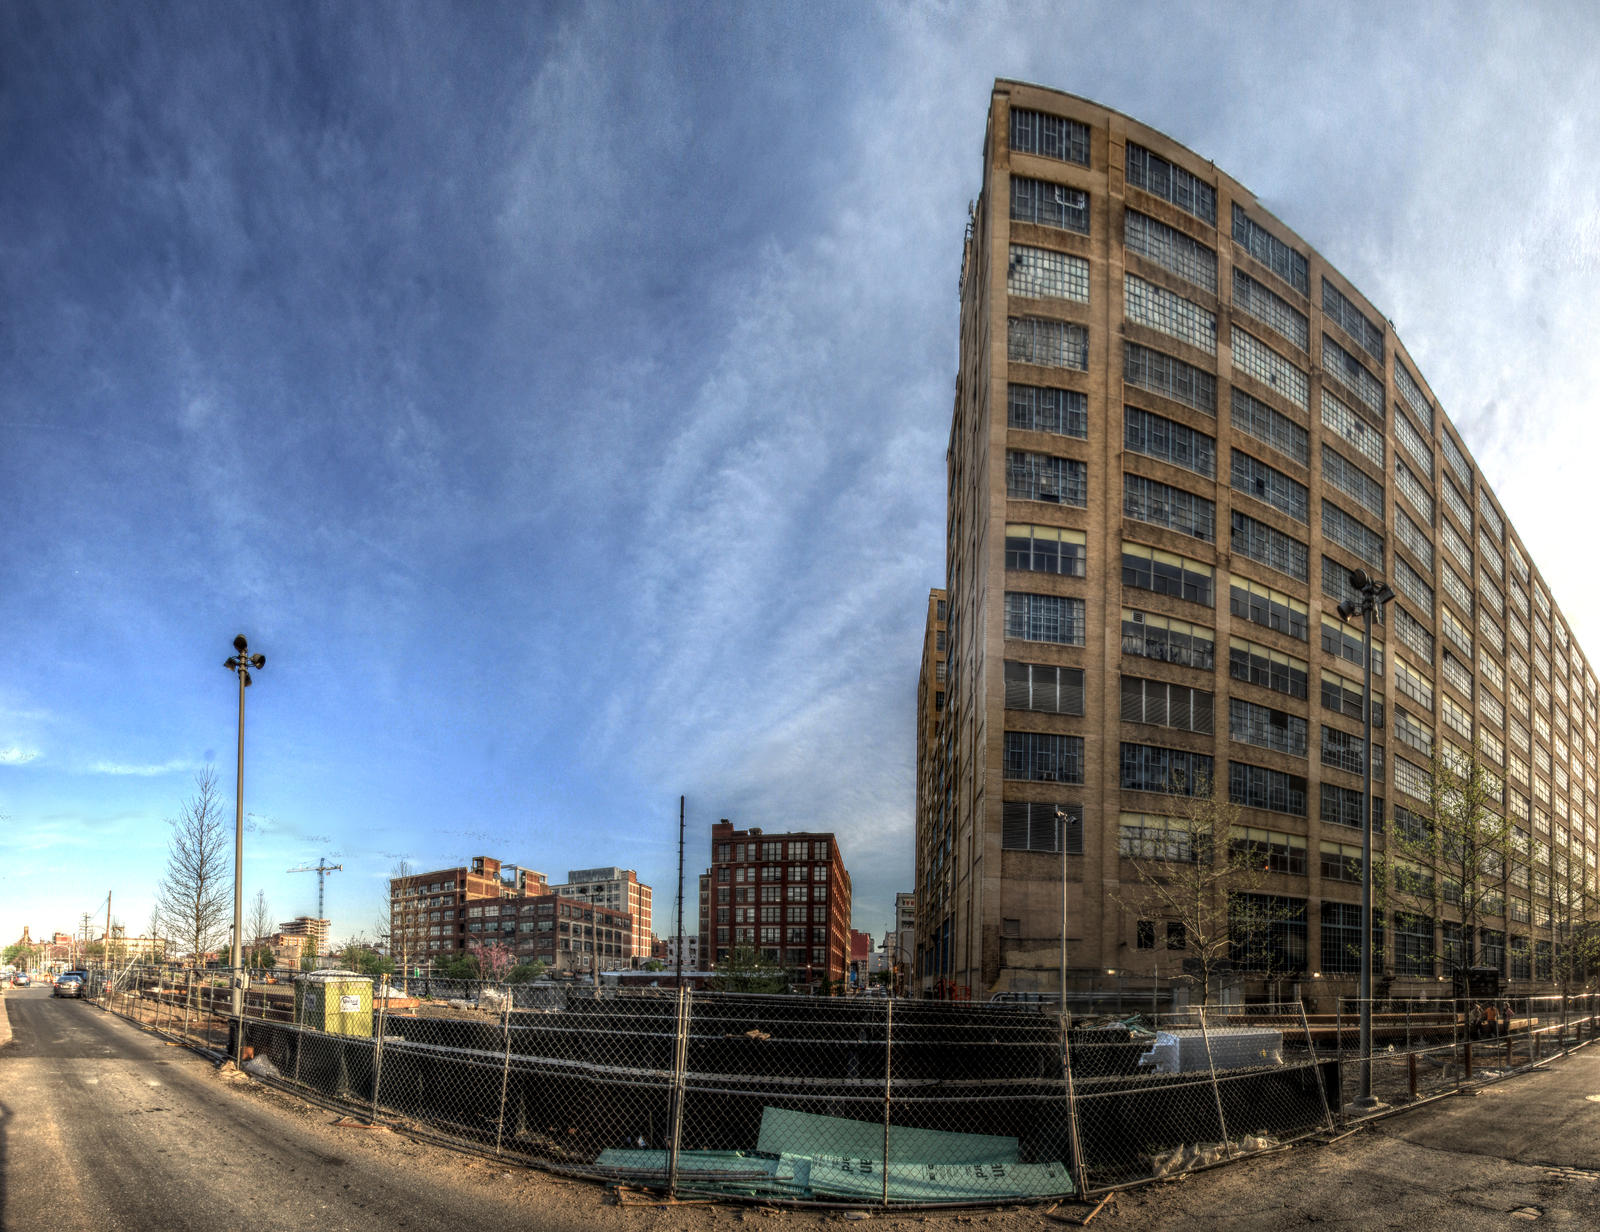 Panorama 3632 hdr pregamma 1 mantiuk06 contrast ma by bruhinb